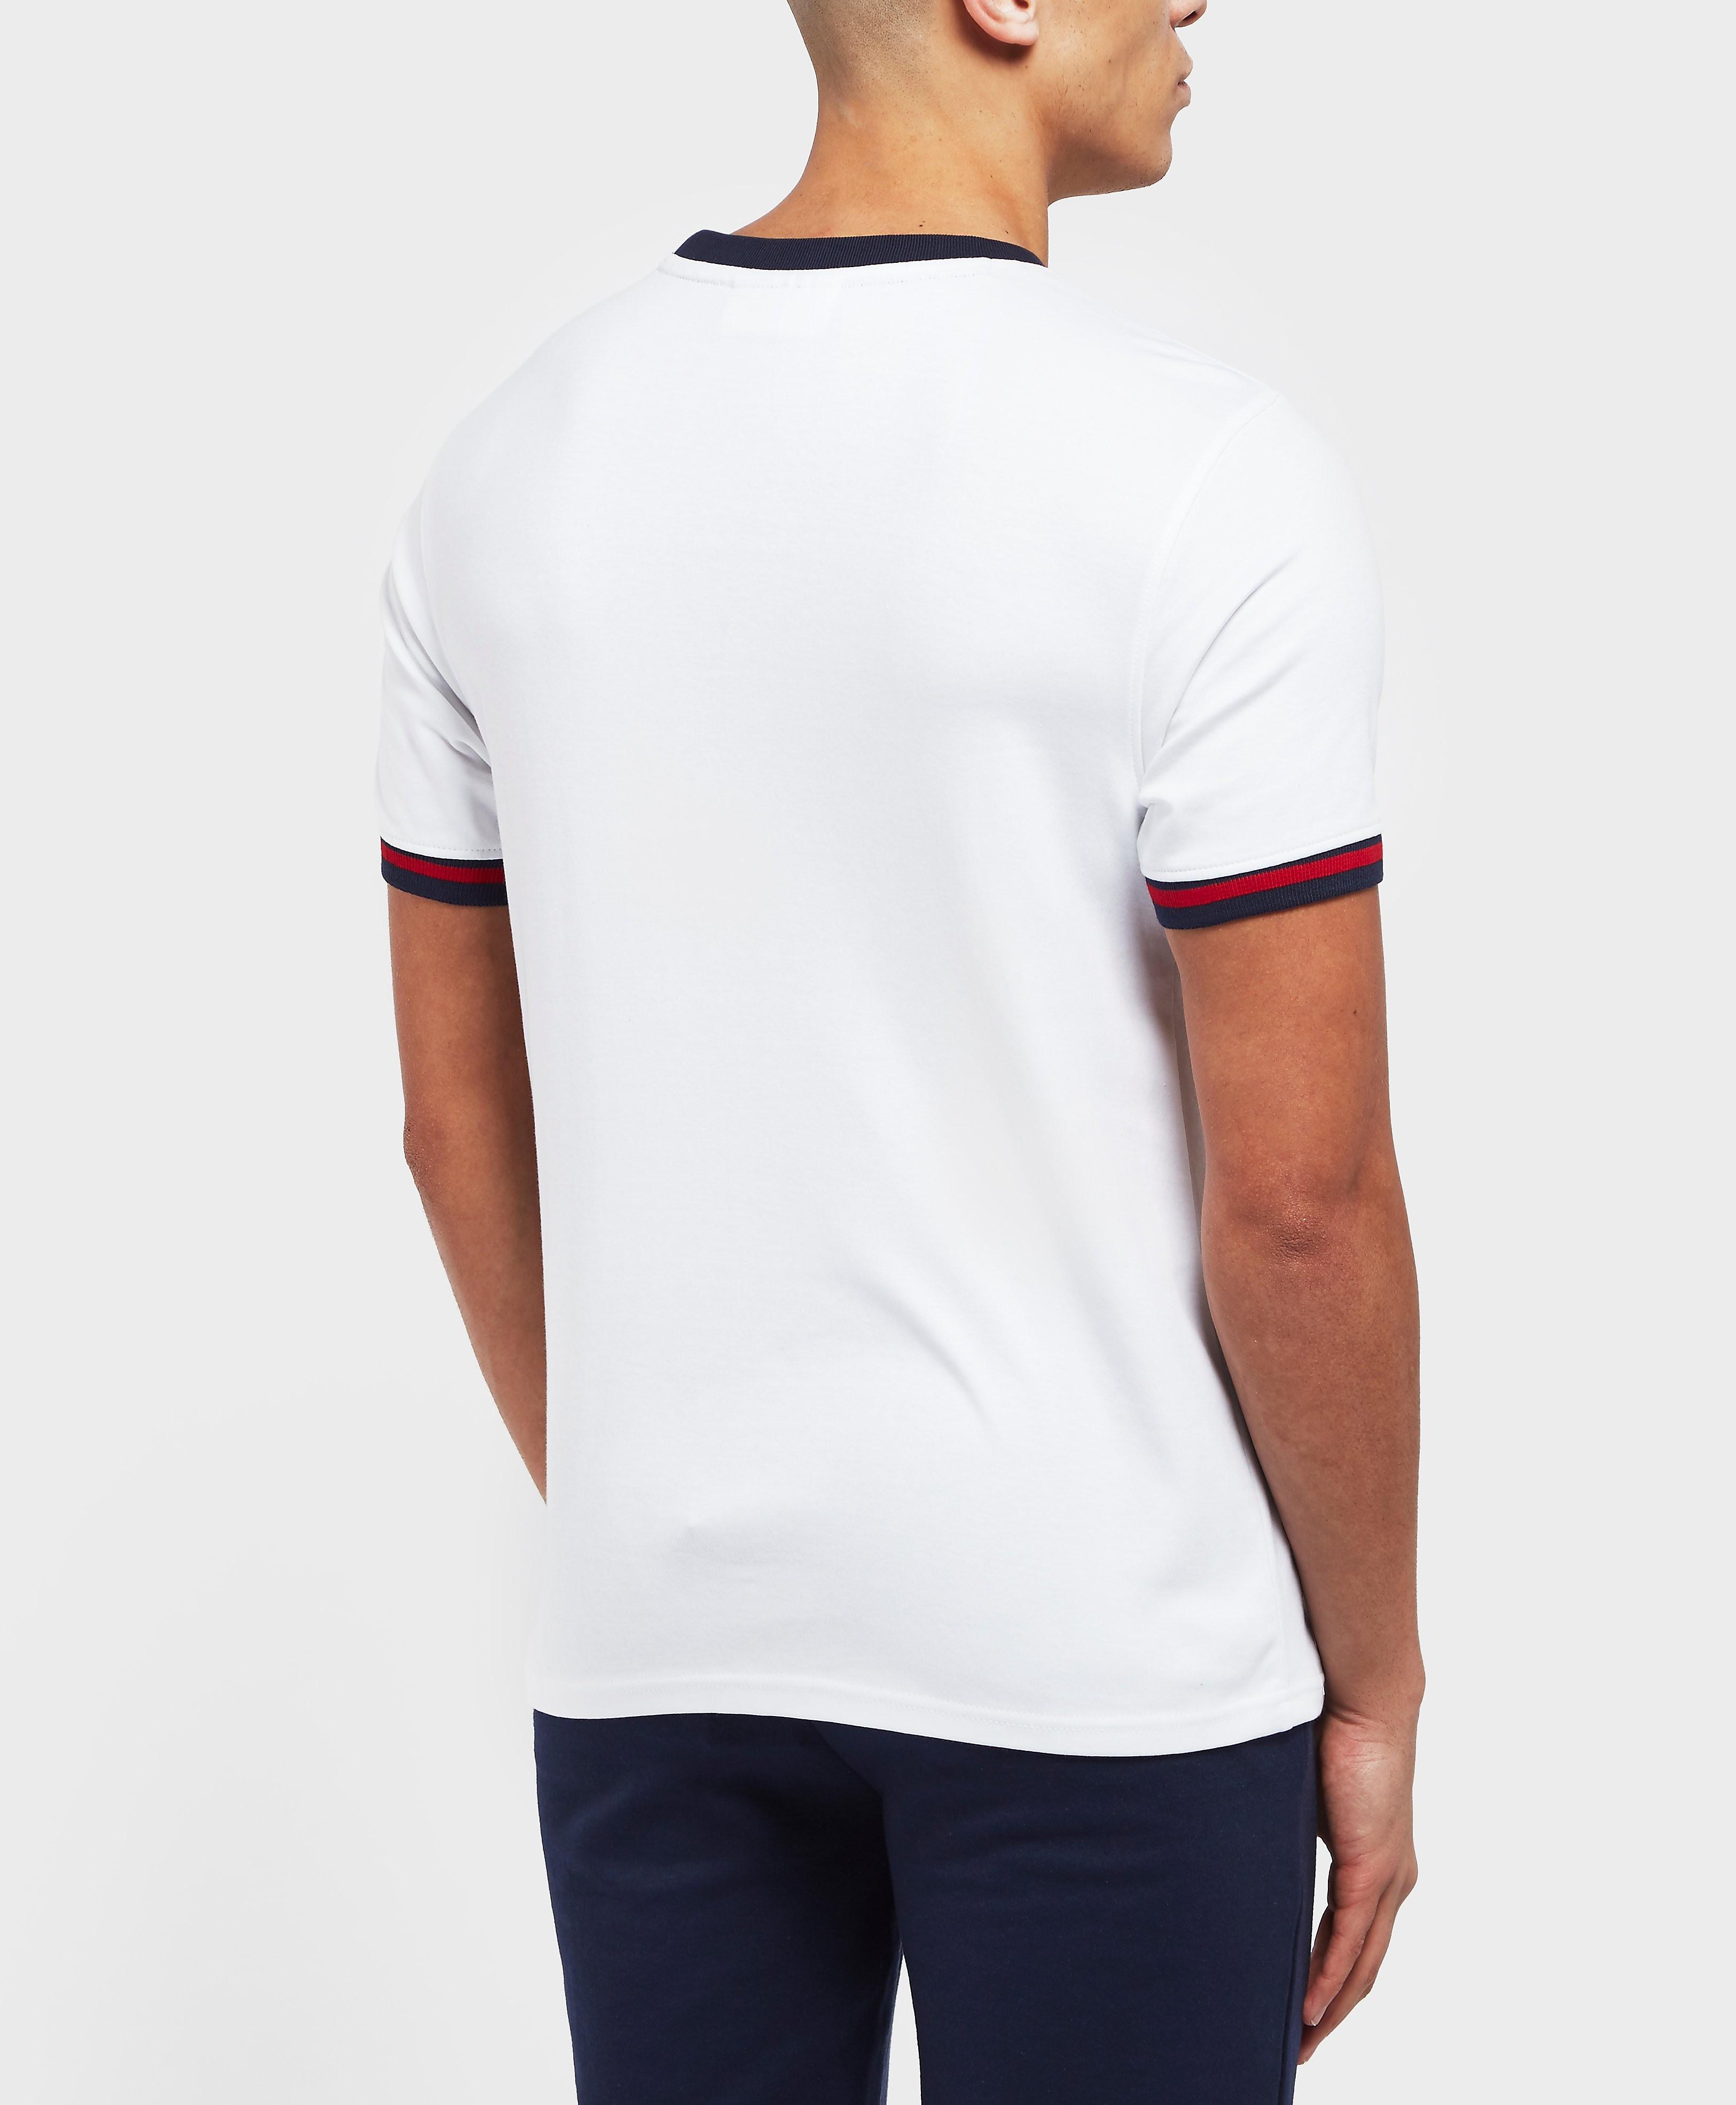 Fila Leandro Short Sleeve T-Shirt